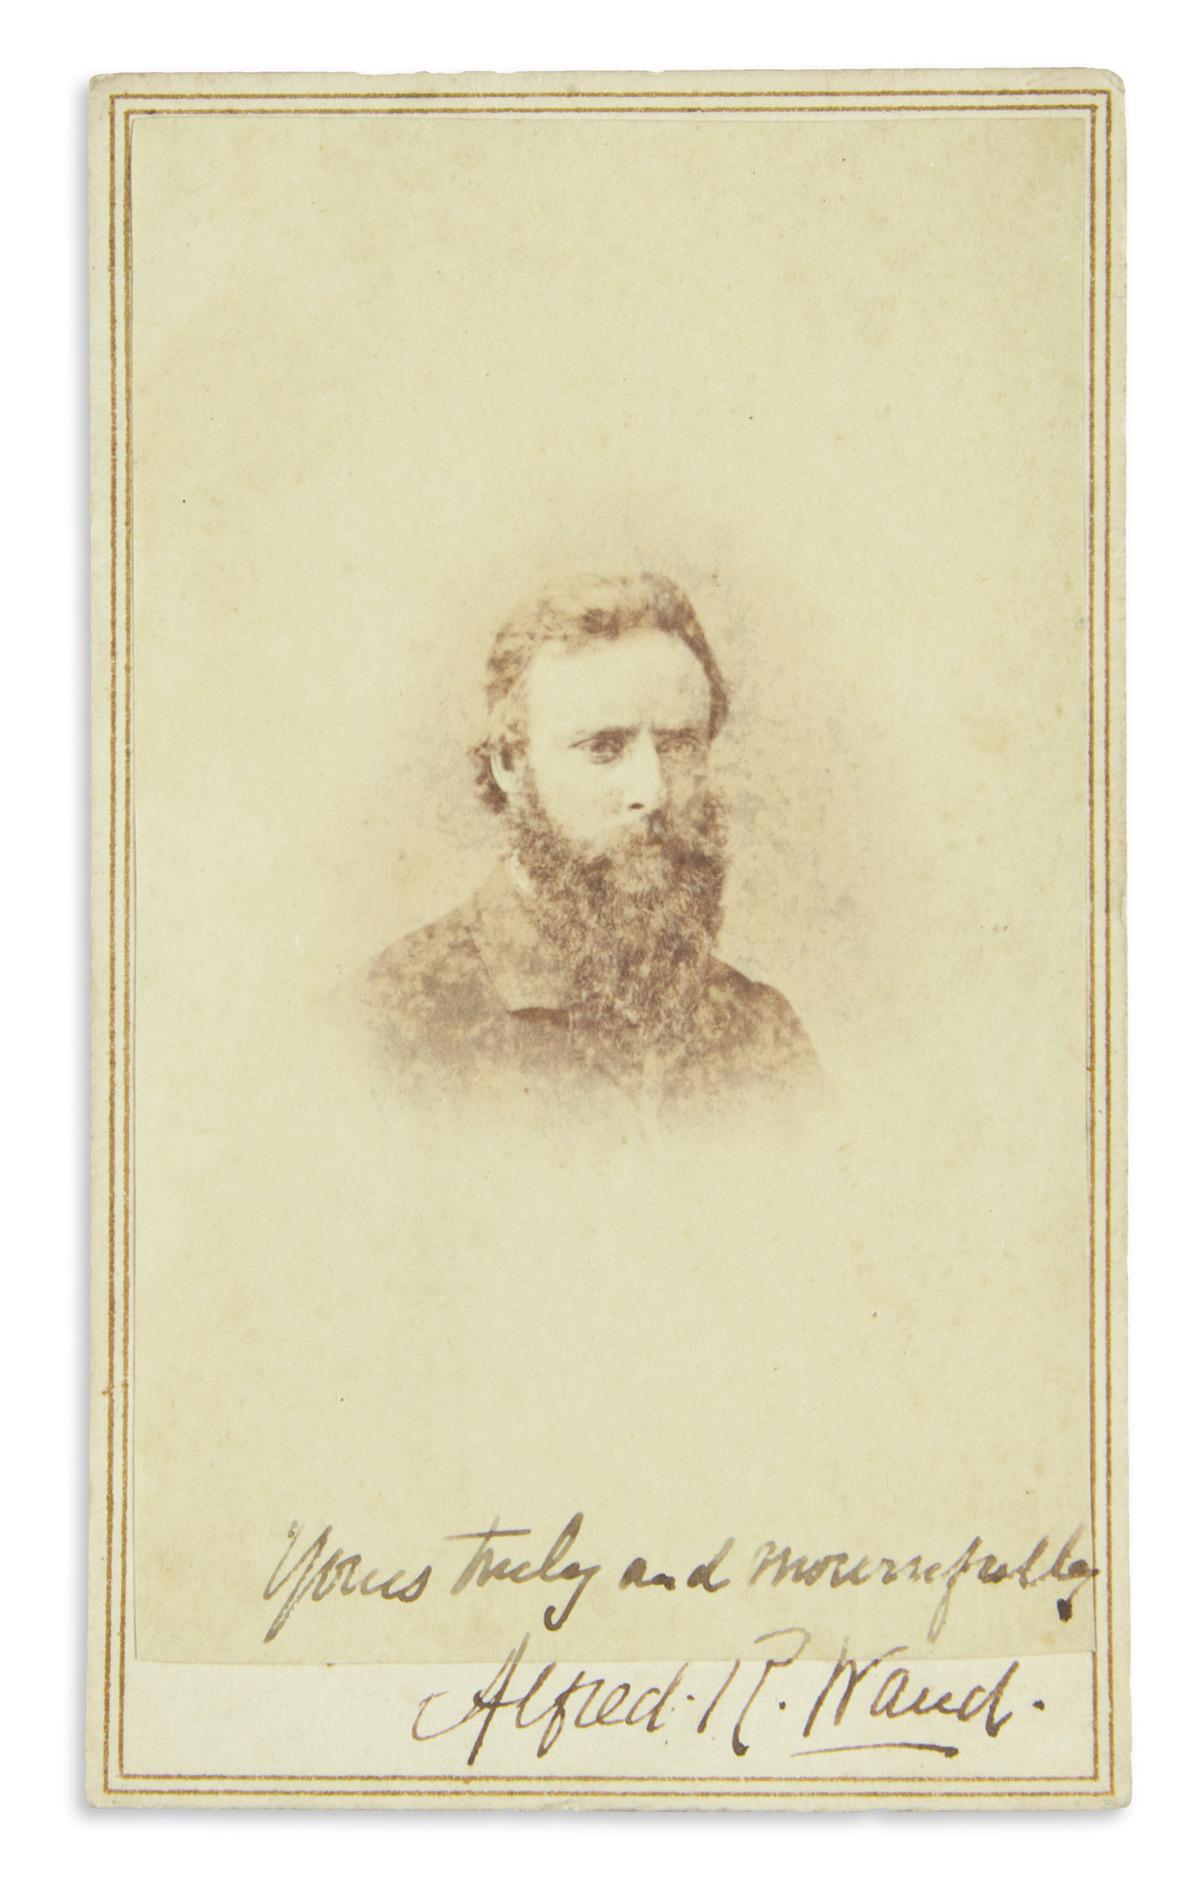 (CIVIL WAR--ART.) Waud, Alfred R. Signed and inscribed carte-de-visite of the great Civil War sketch artist.